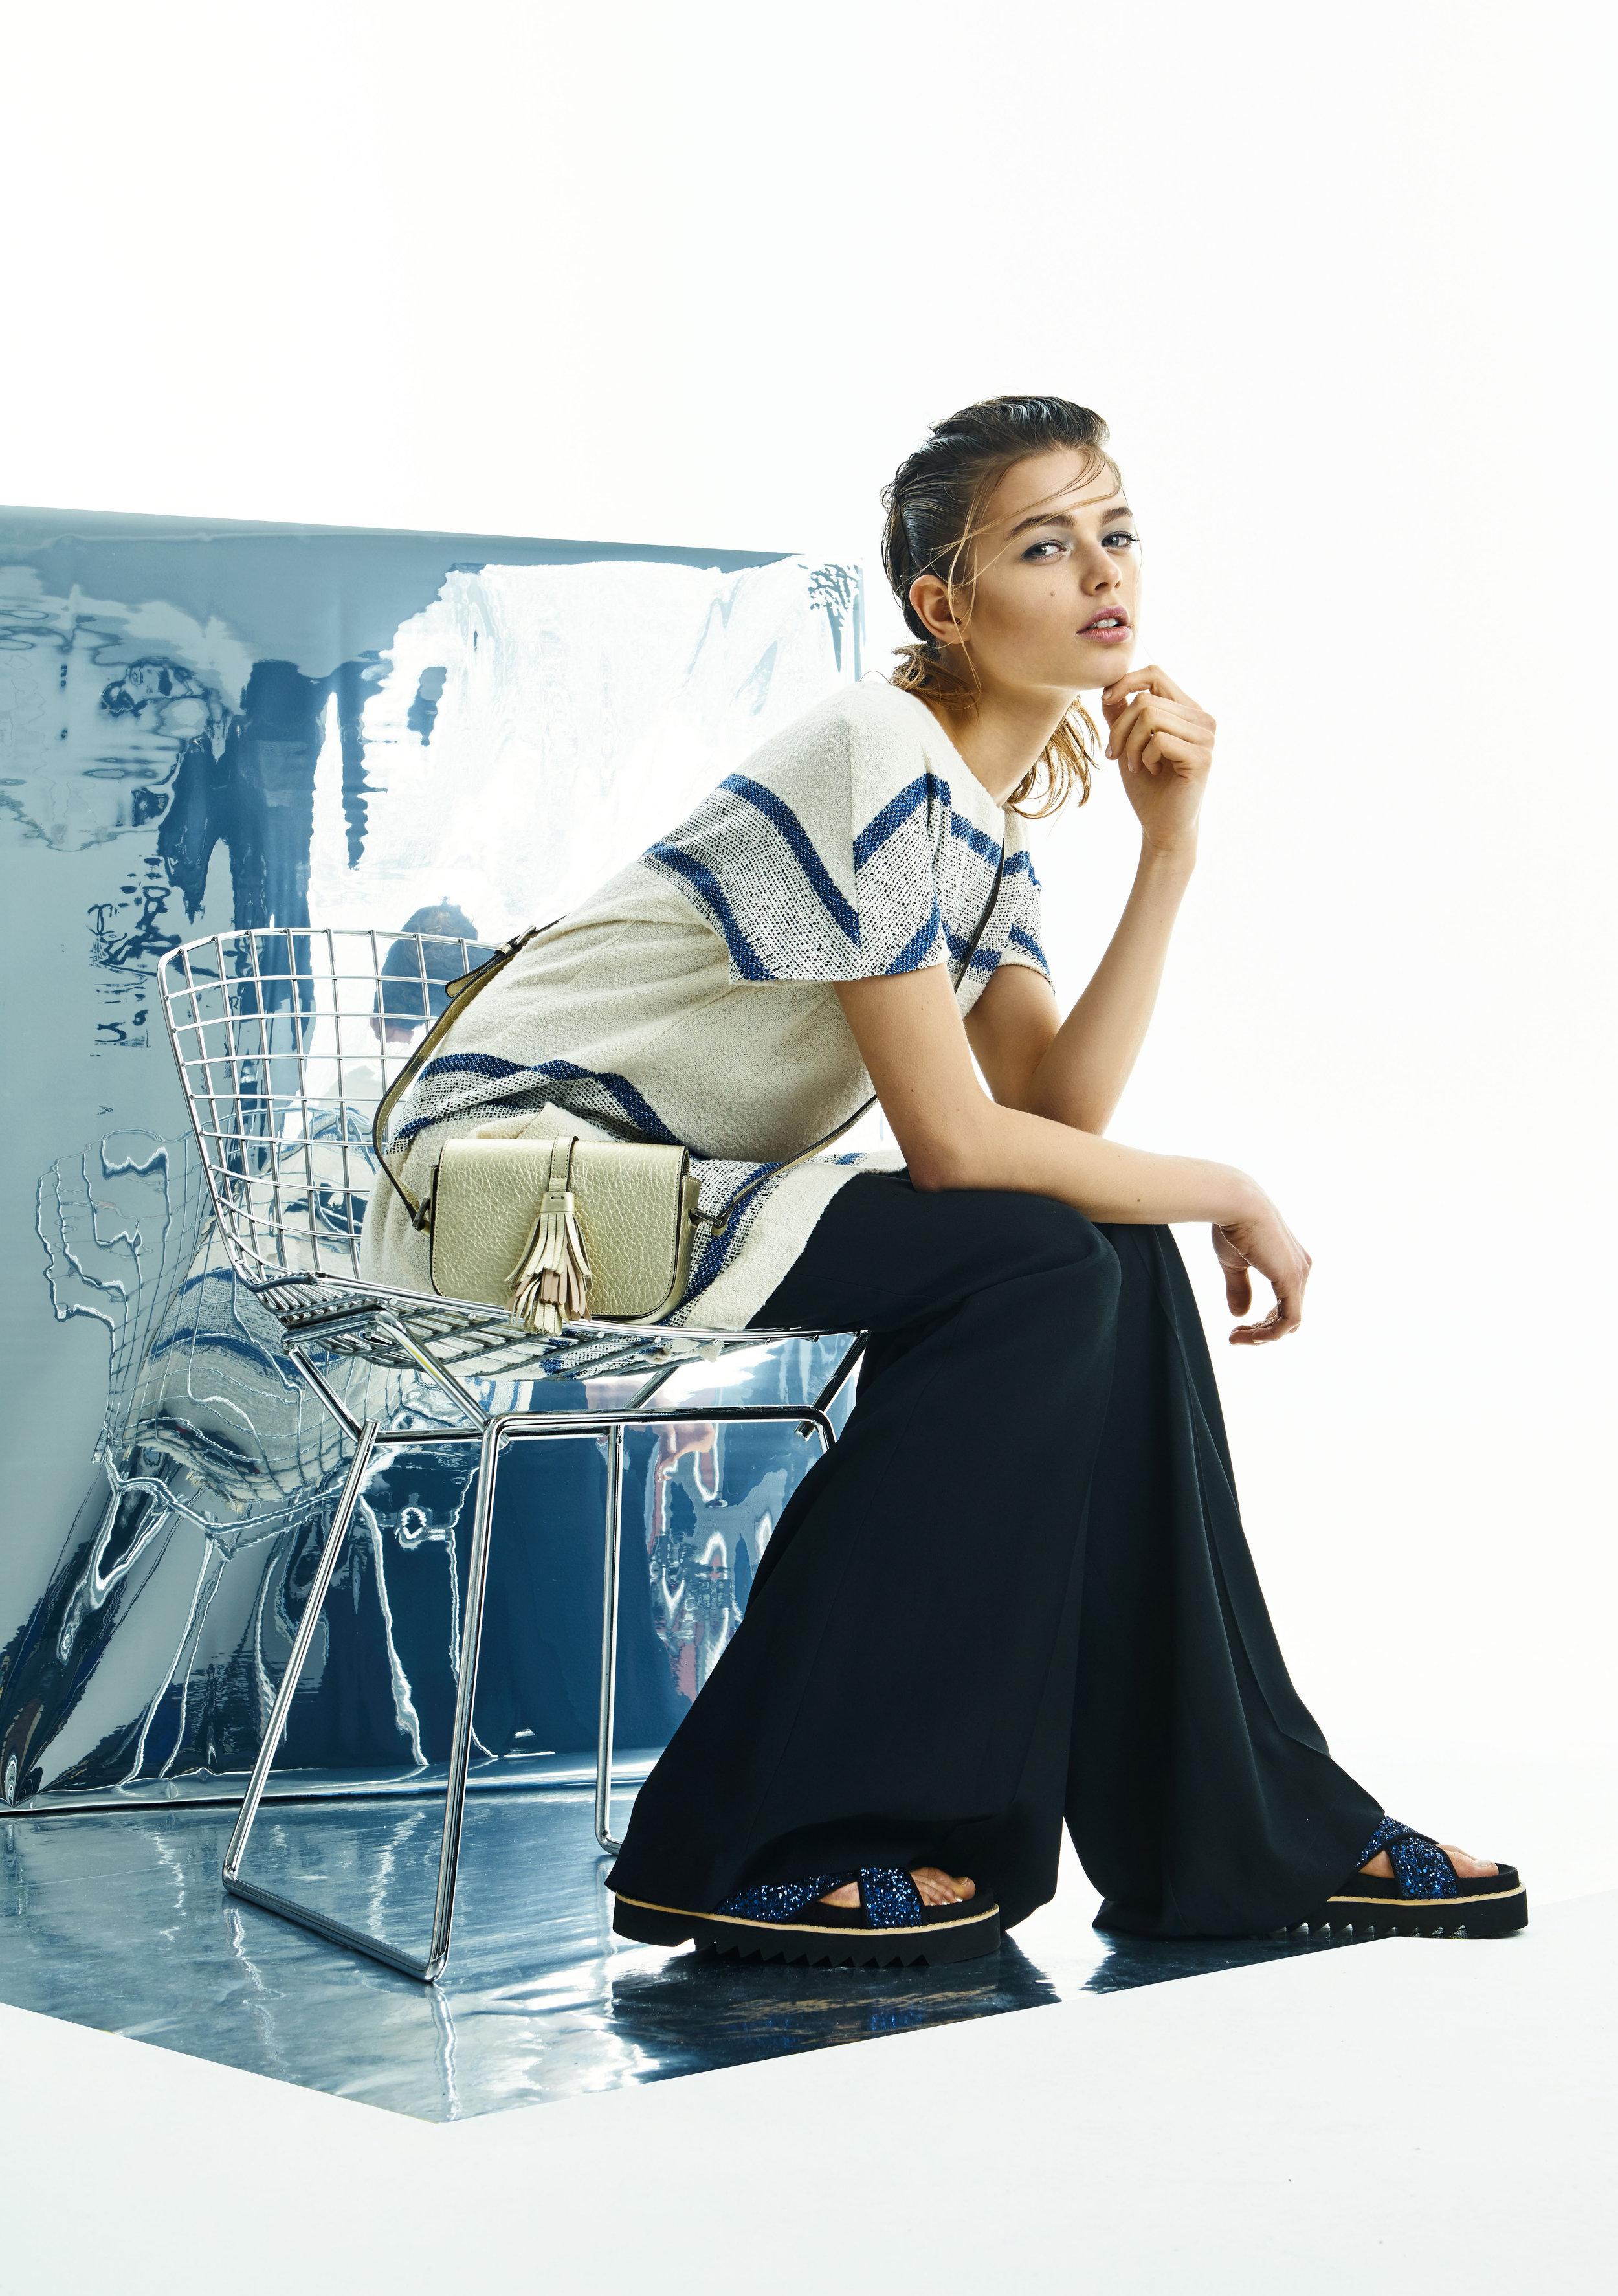 Dress, Closed; trousers, Patrizia Pepe; bag,Steffen Schraut; shoes, Privada